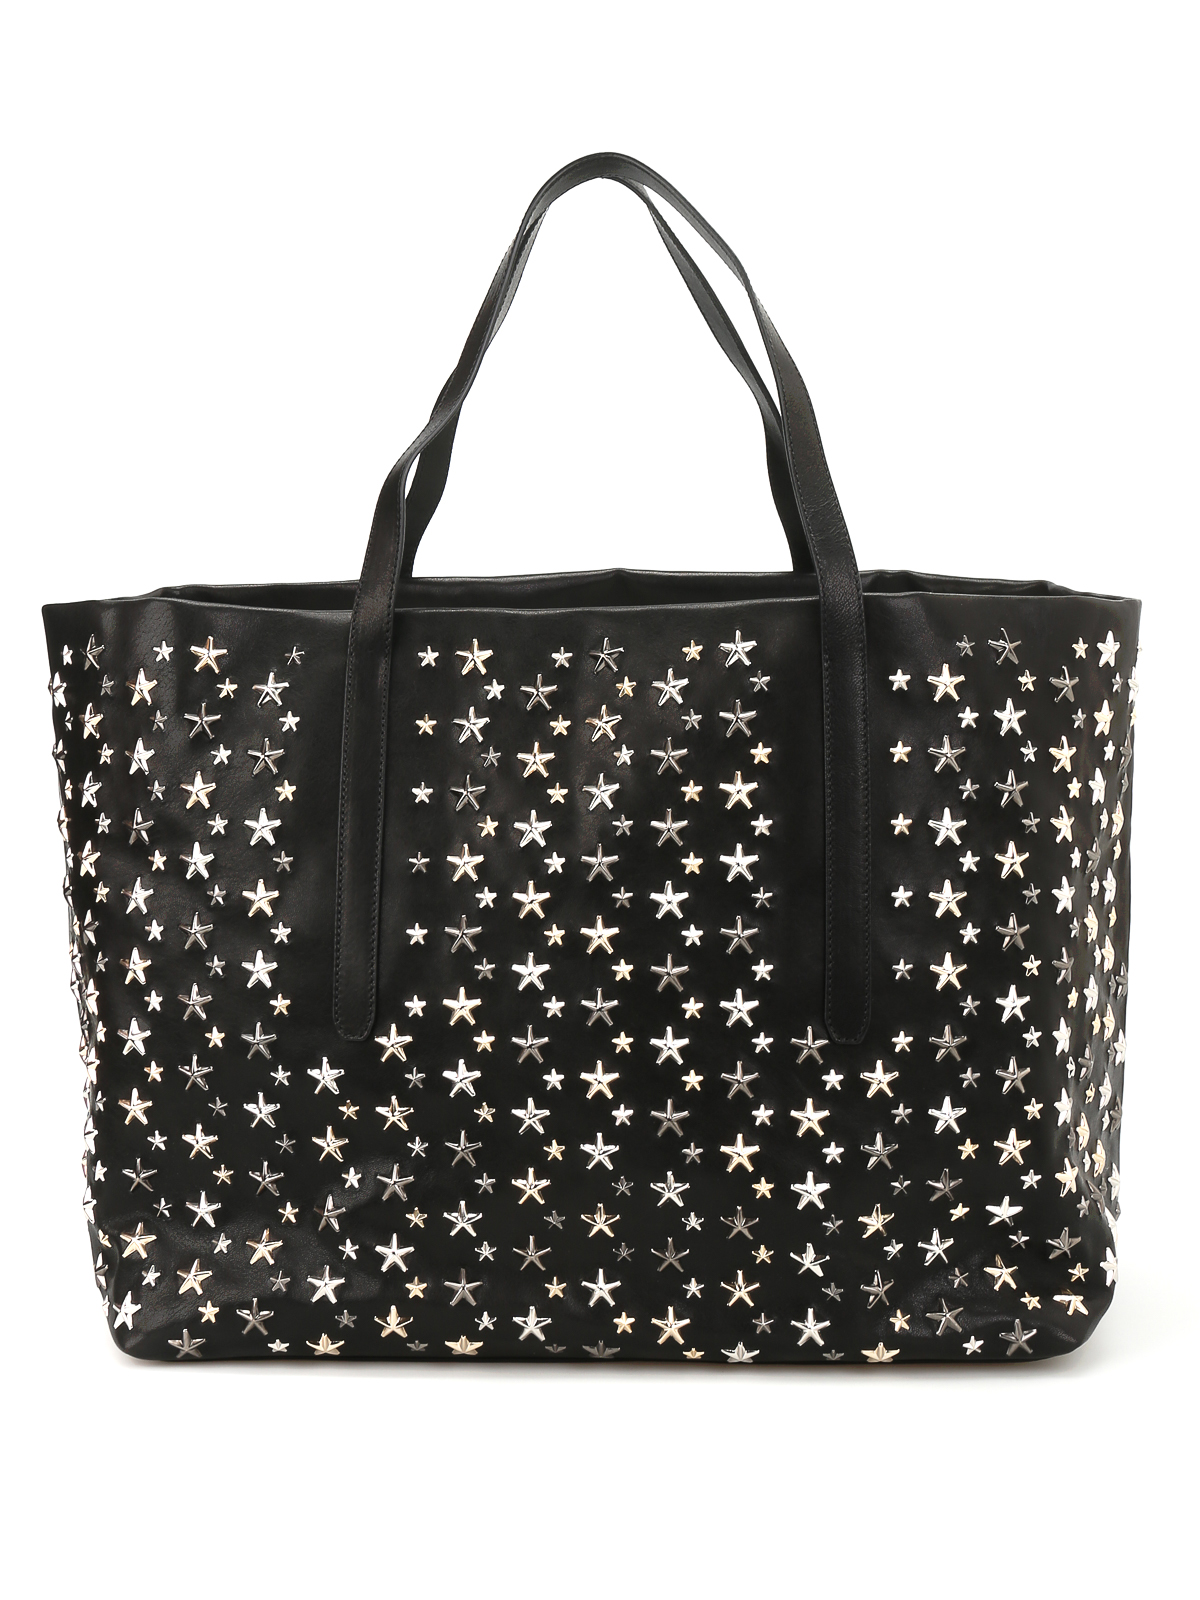 Jimmy choo bags online shopping